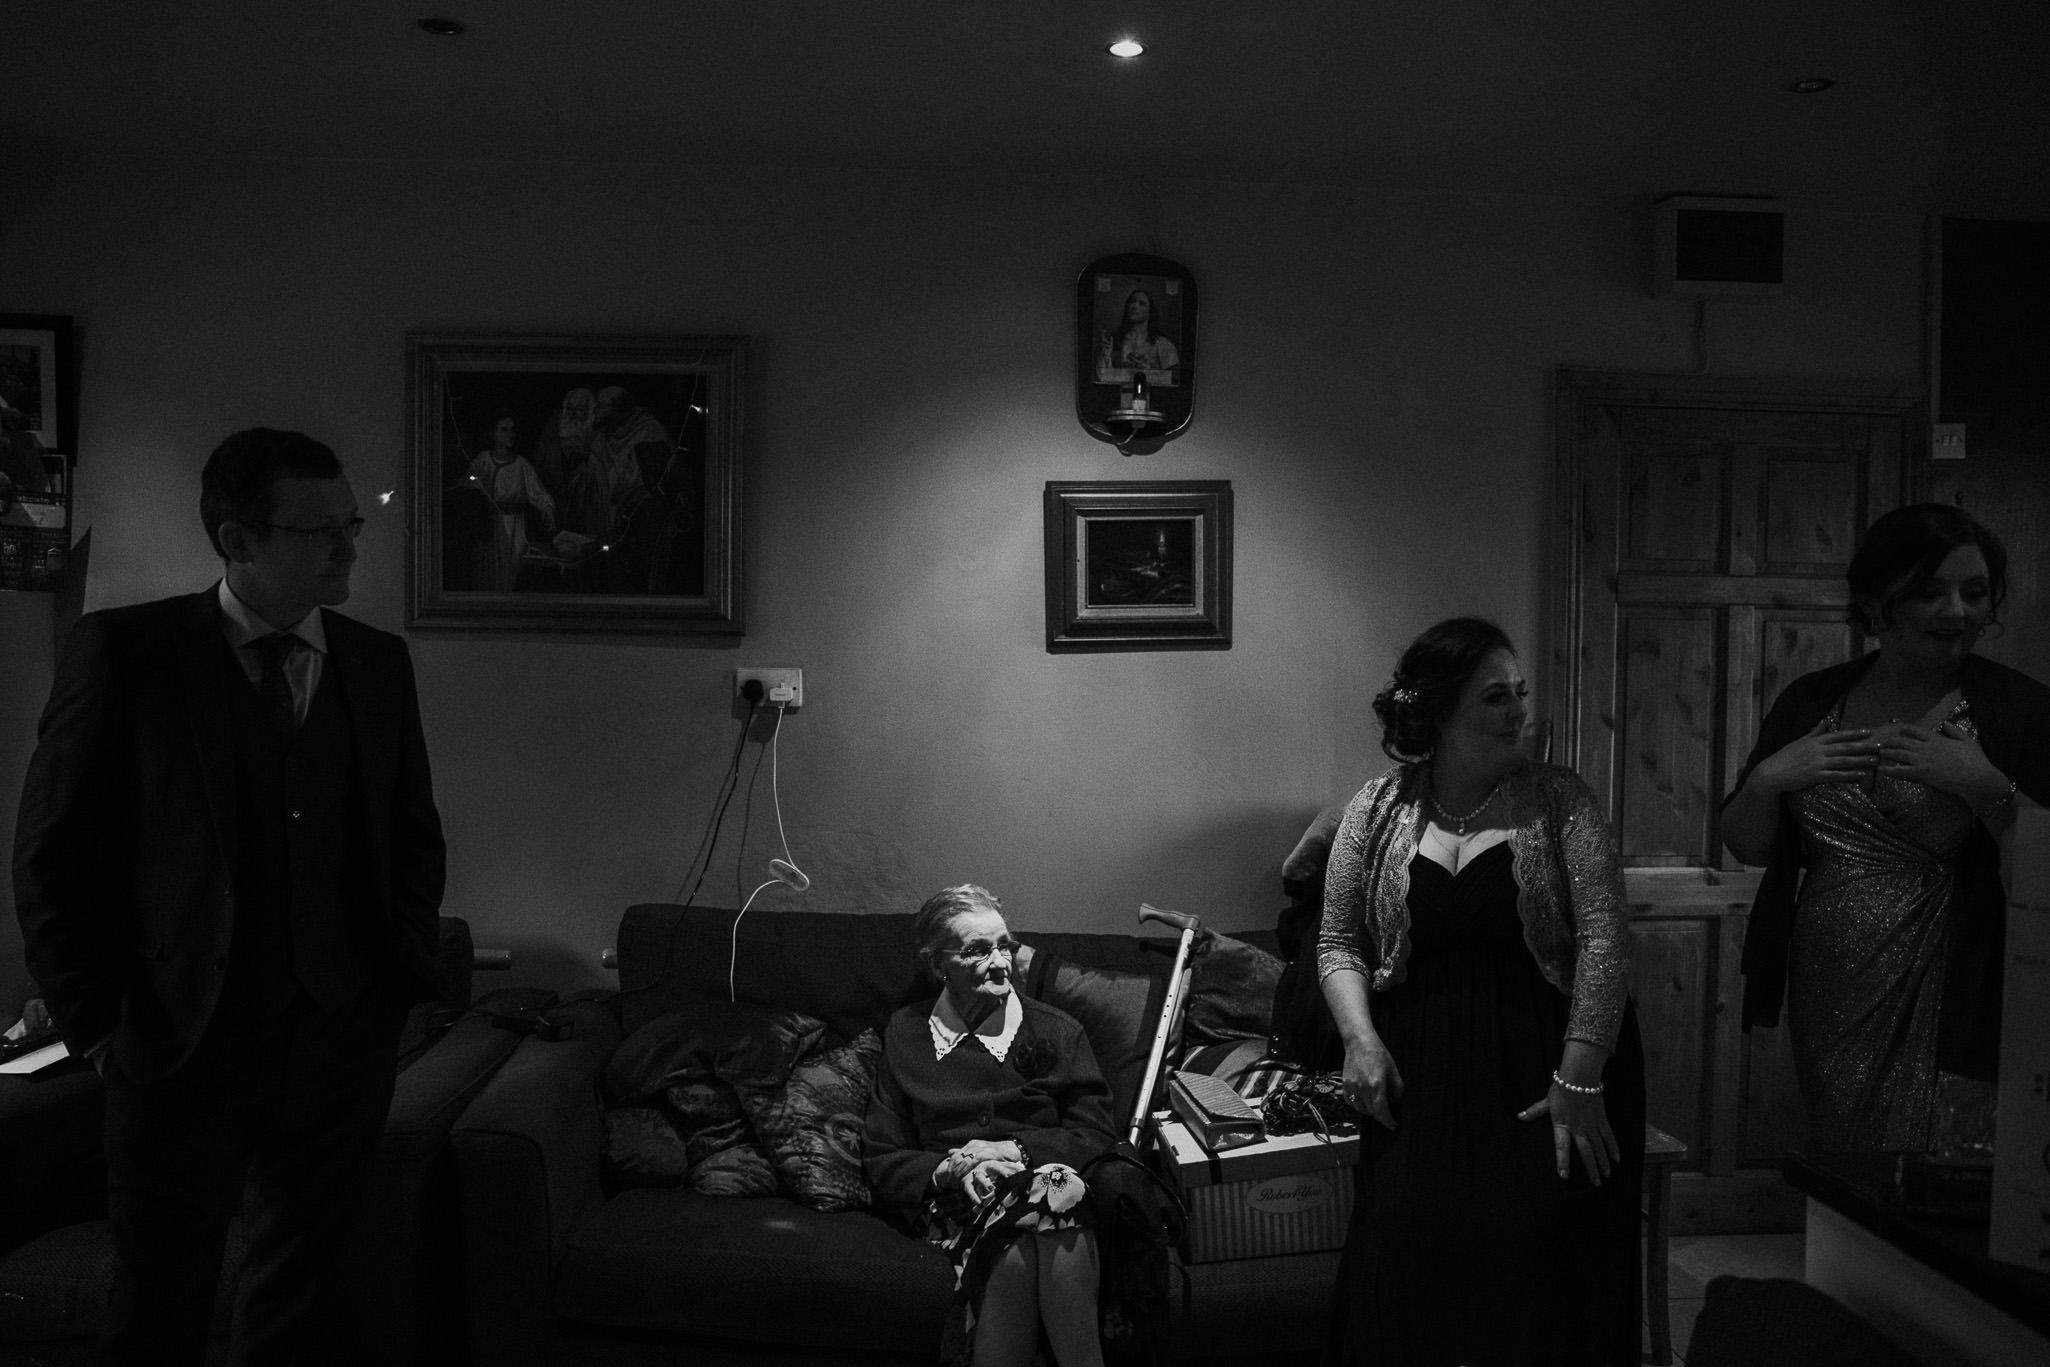 clairebyrnephotography-wedding-night-sparklers-new-years-eve-denyce-leonard-4.jpg